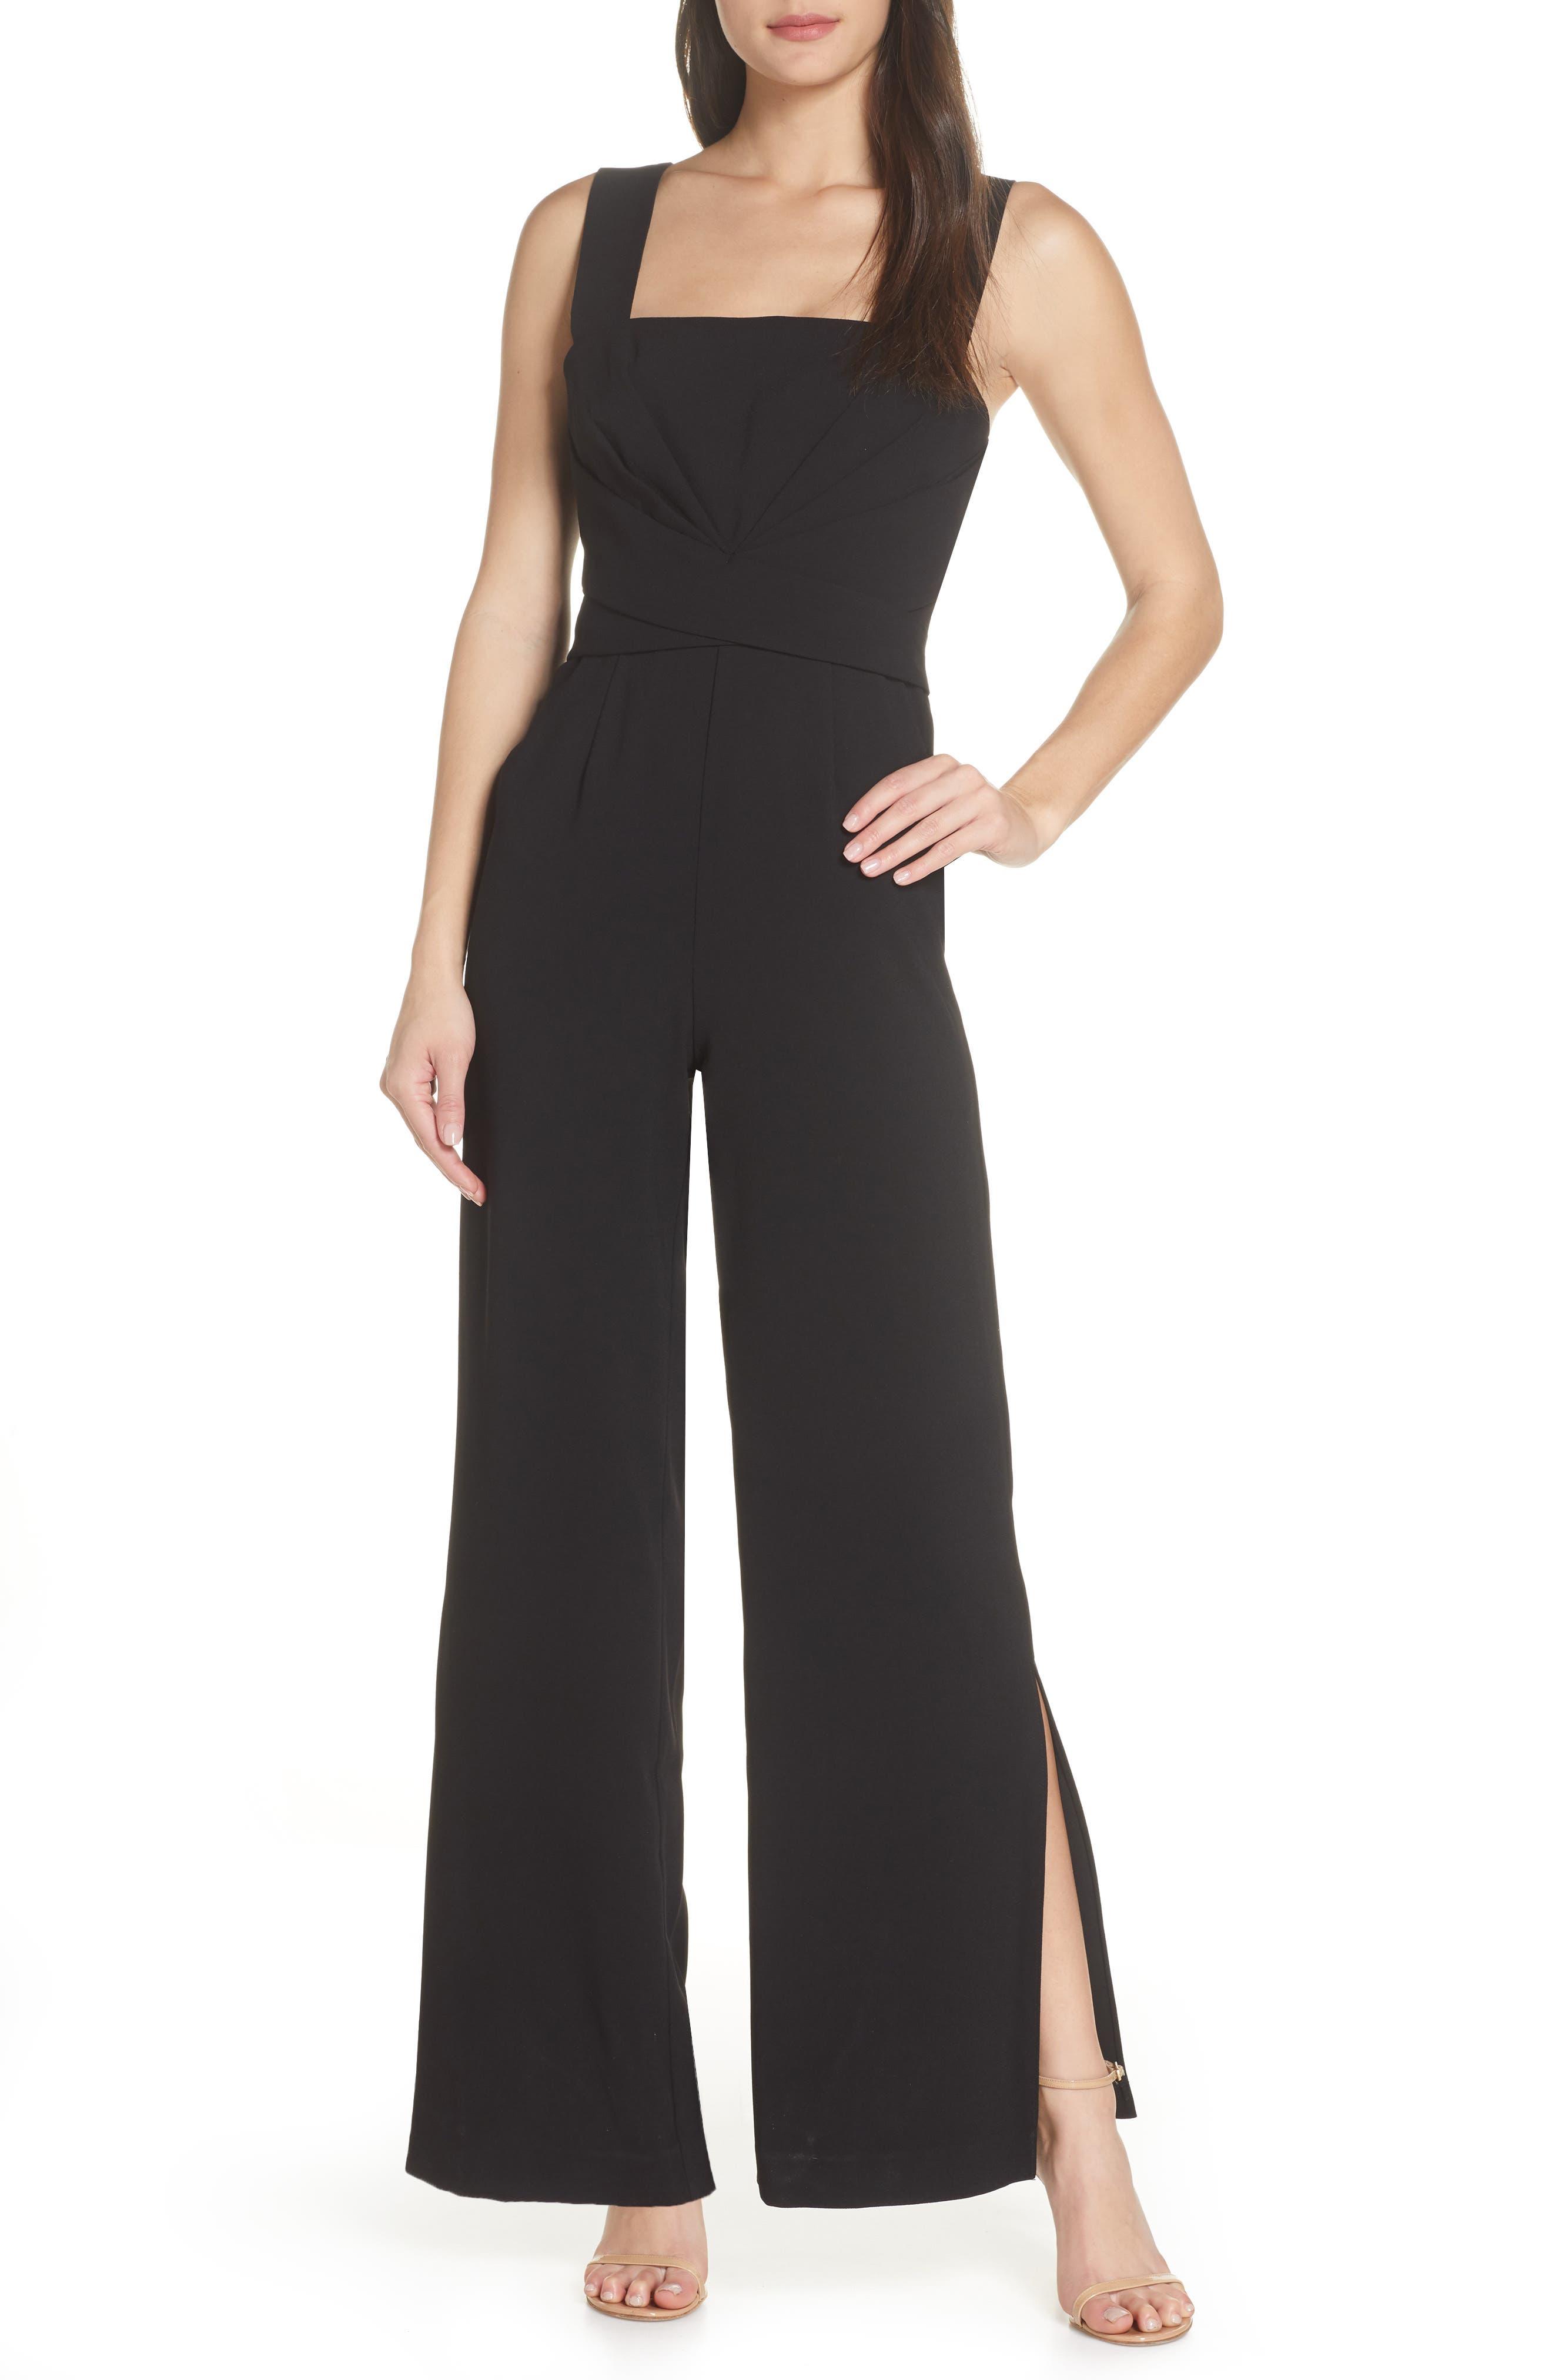 Vintage High Waisted Trousers, Sailor Pants, Jeans Womens Foxiedox Slit Leg Cocktail Jumpsuit $148.00 AT vintagedancer.com